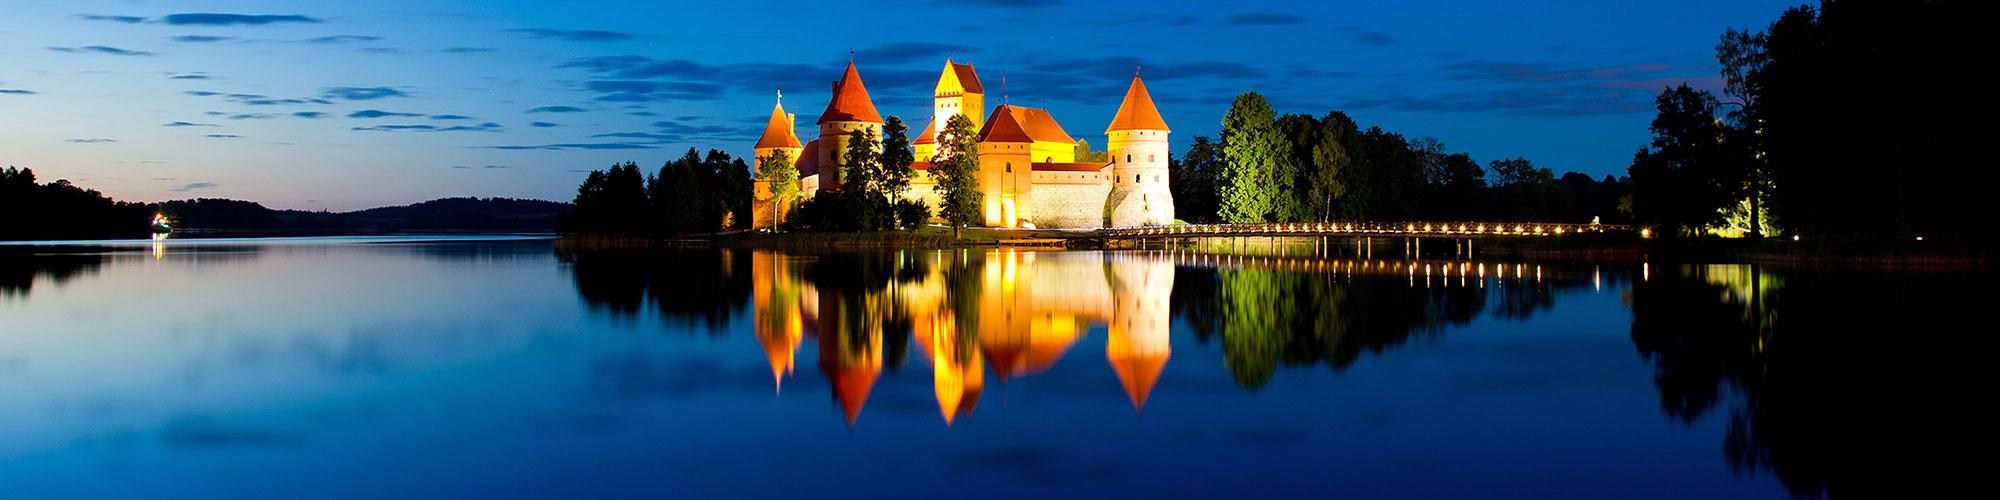 Lithuanian Translations Symbolised by Lake Castle at Night